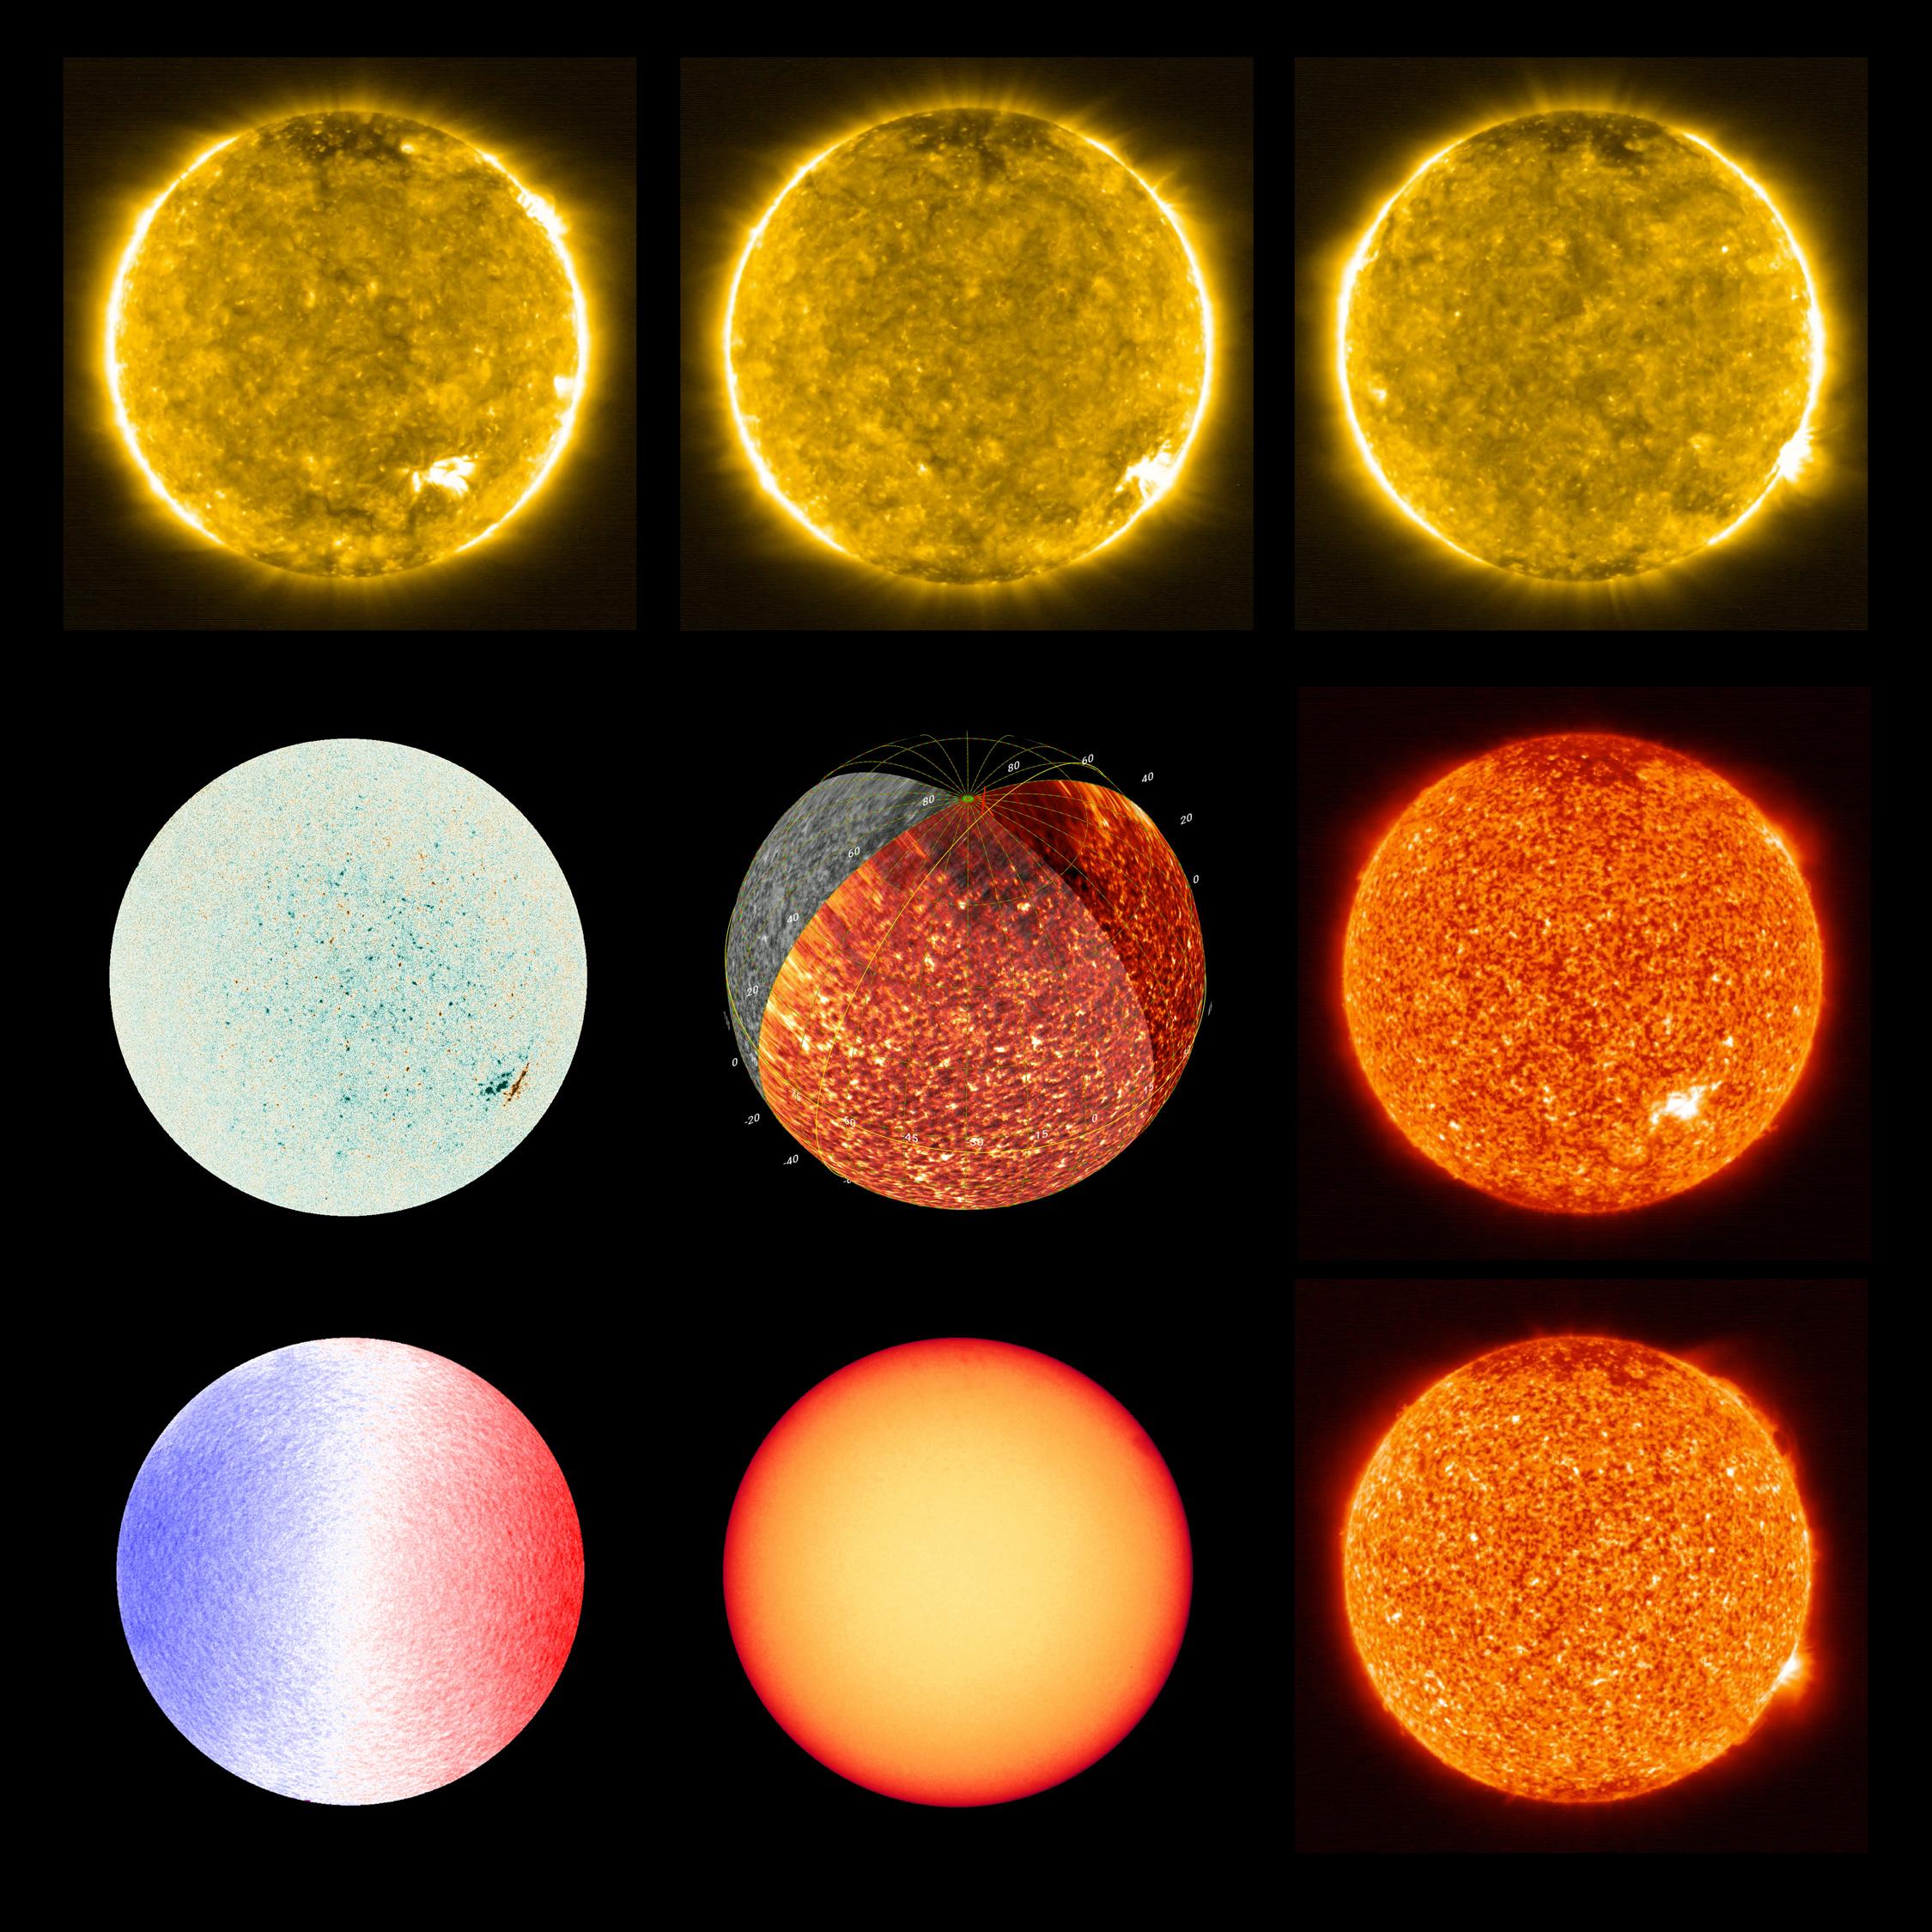 Les différentes observations du Soleil par Solar Orbitera